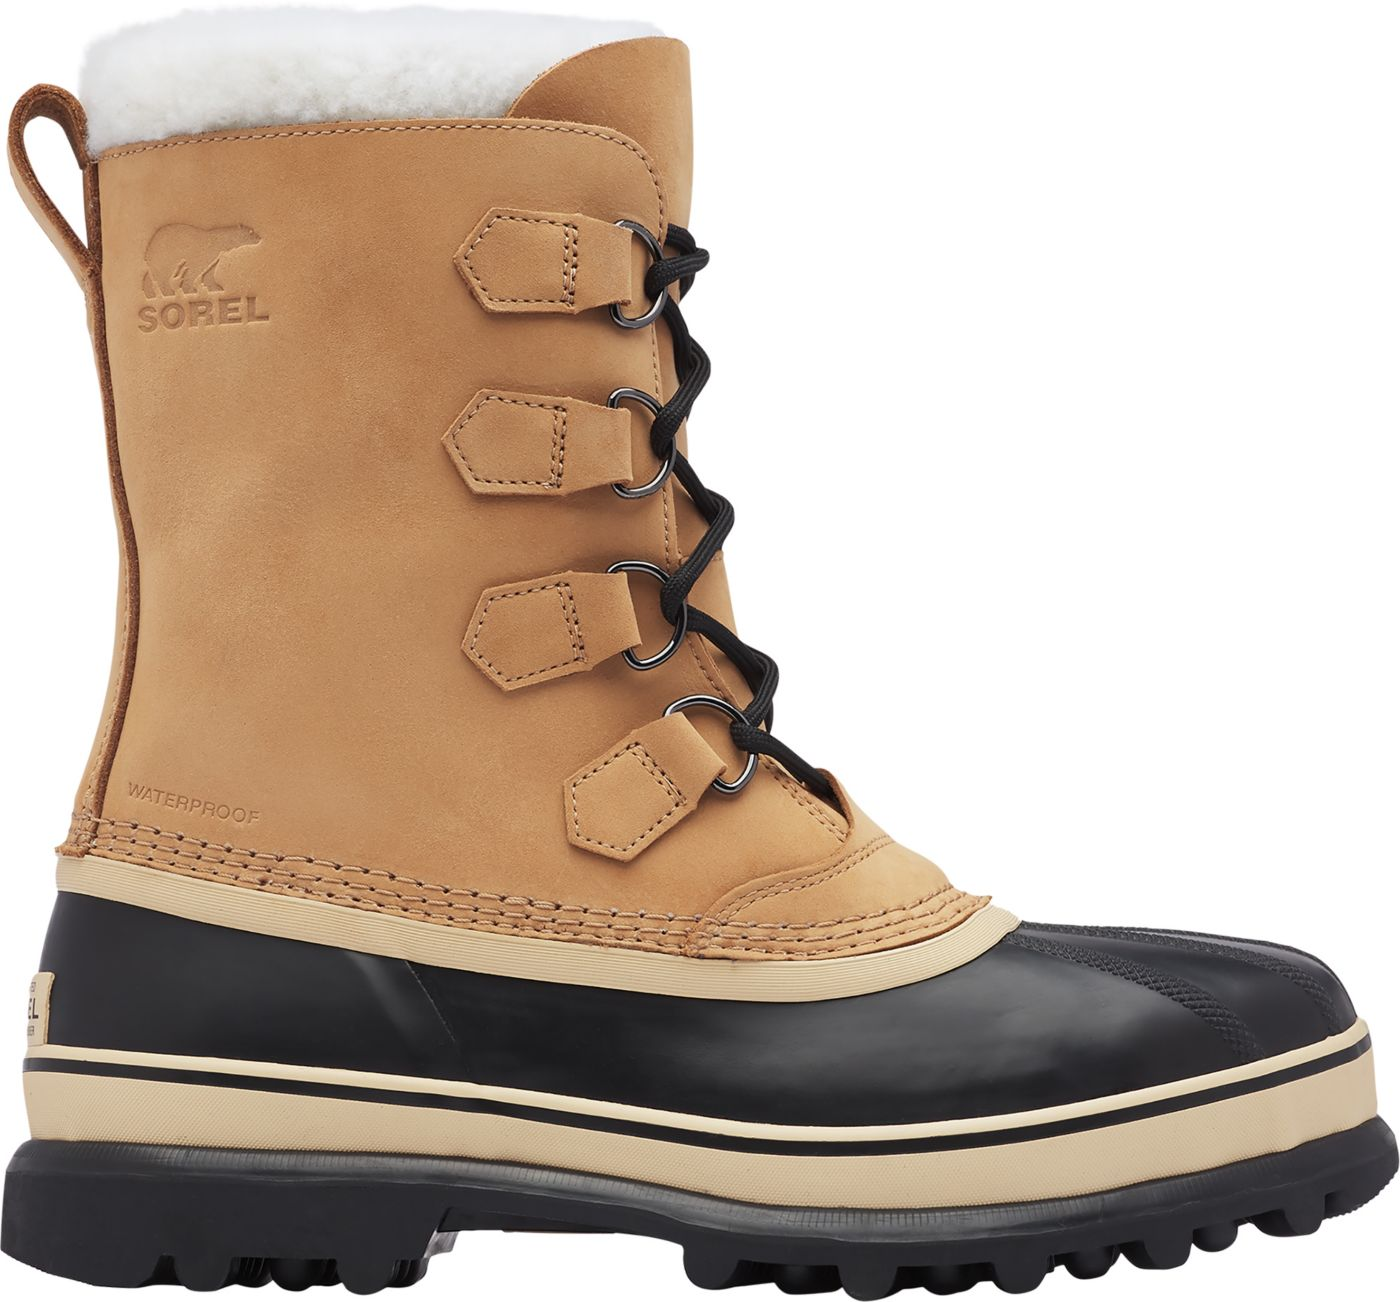 SOREL Men's Caribou Waterproof Winter Boots